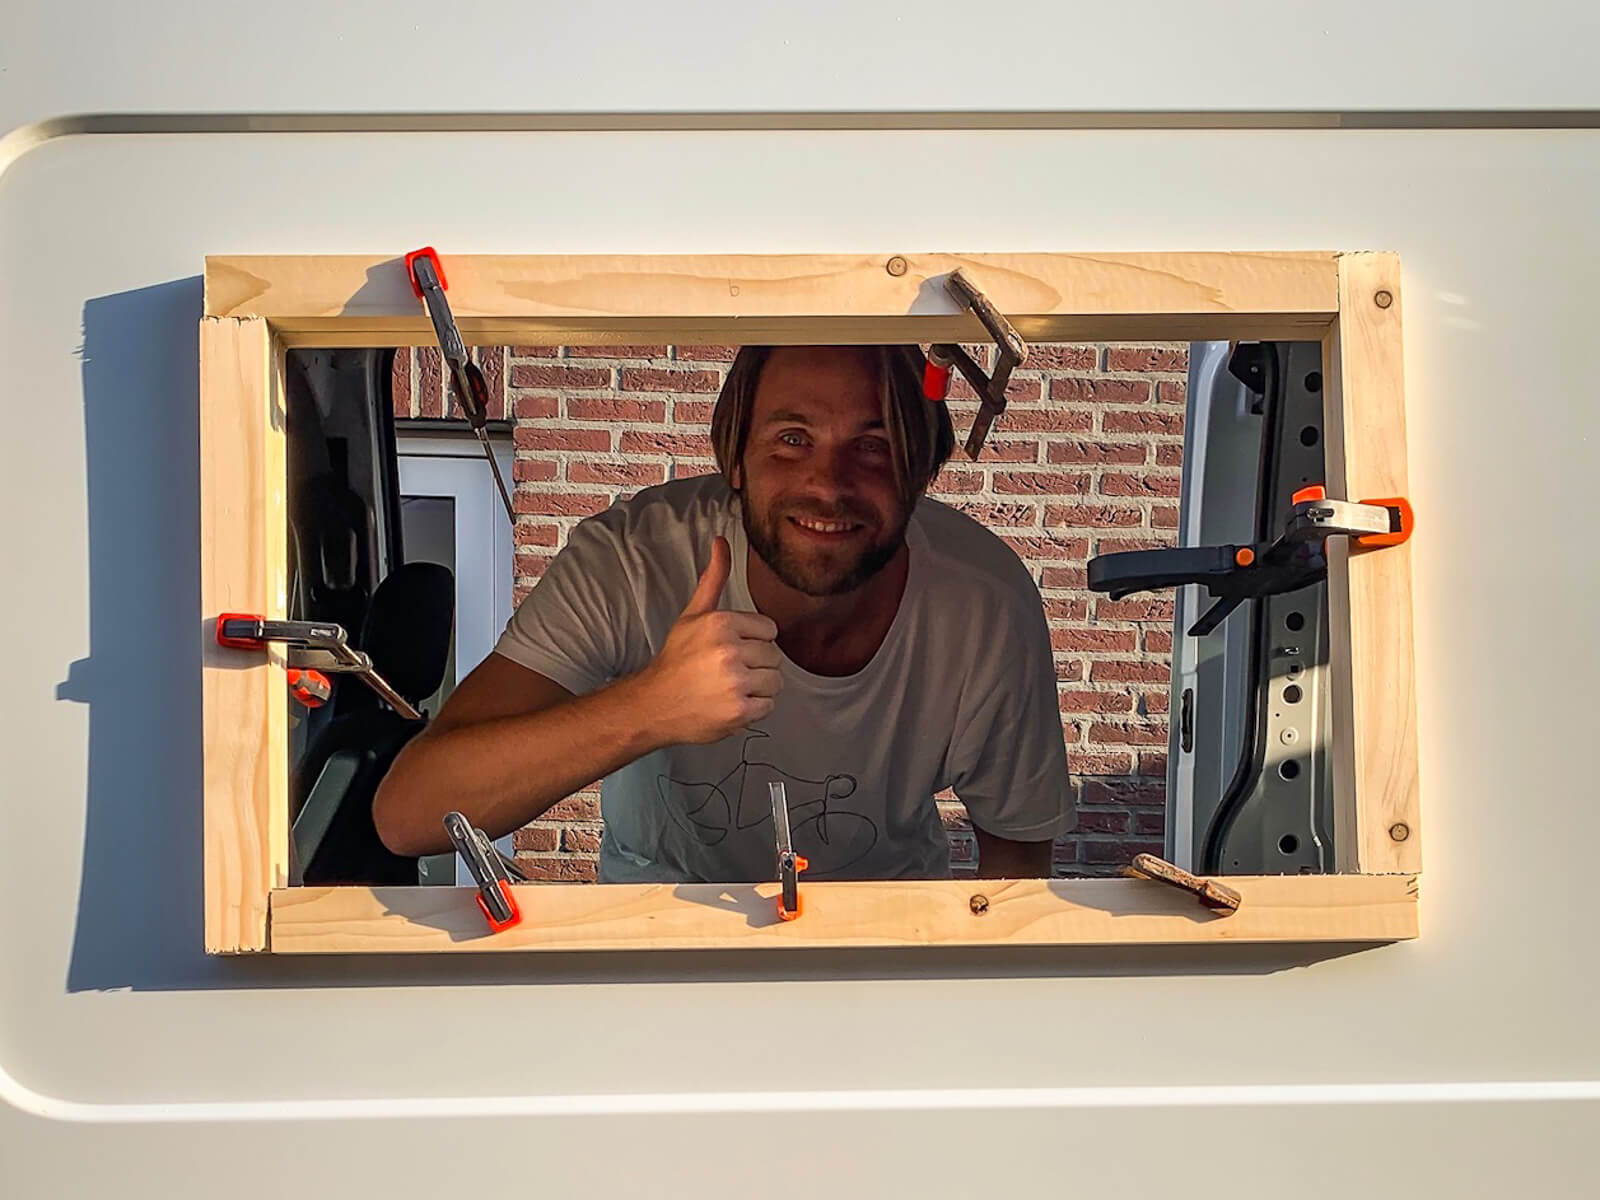 Camper ramen inbouwen - houten framewerk bevestigen